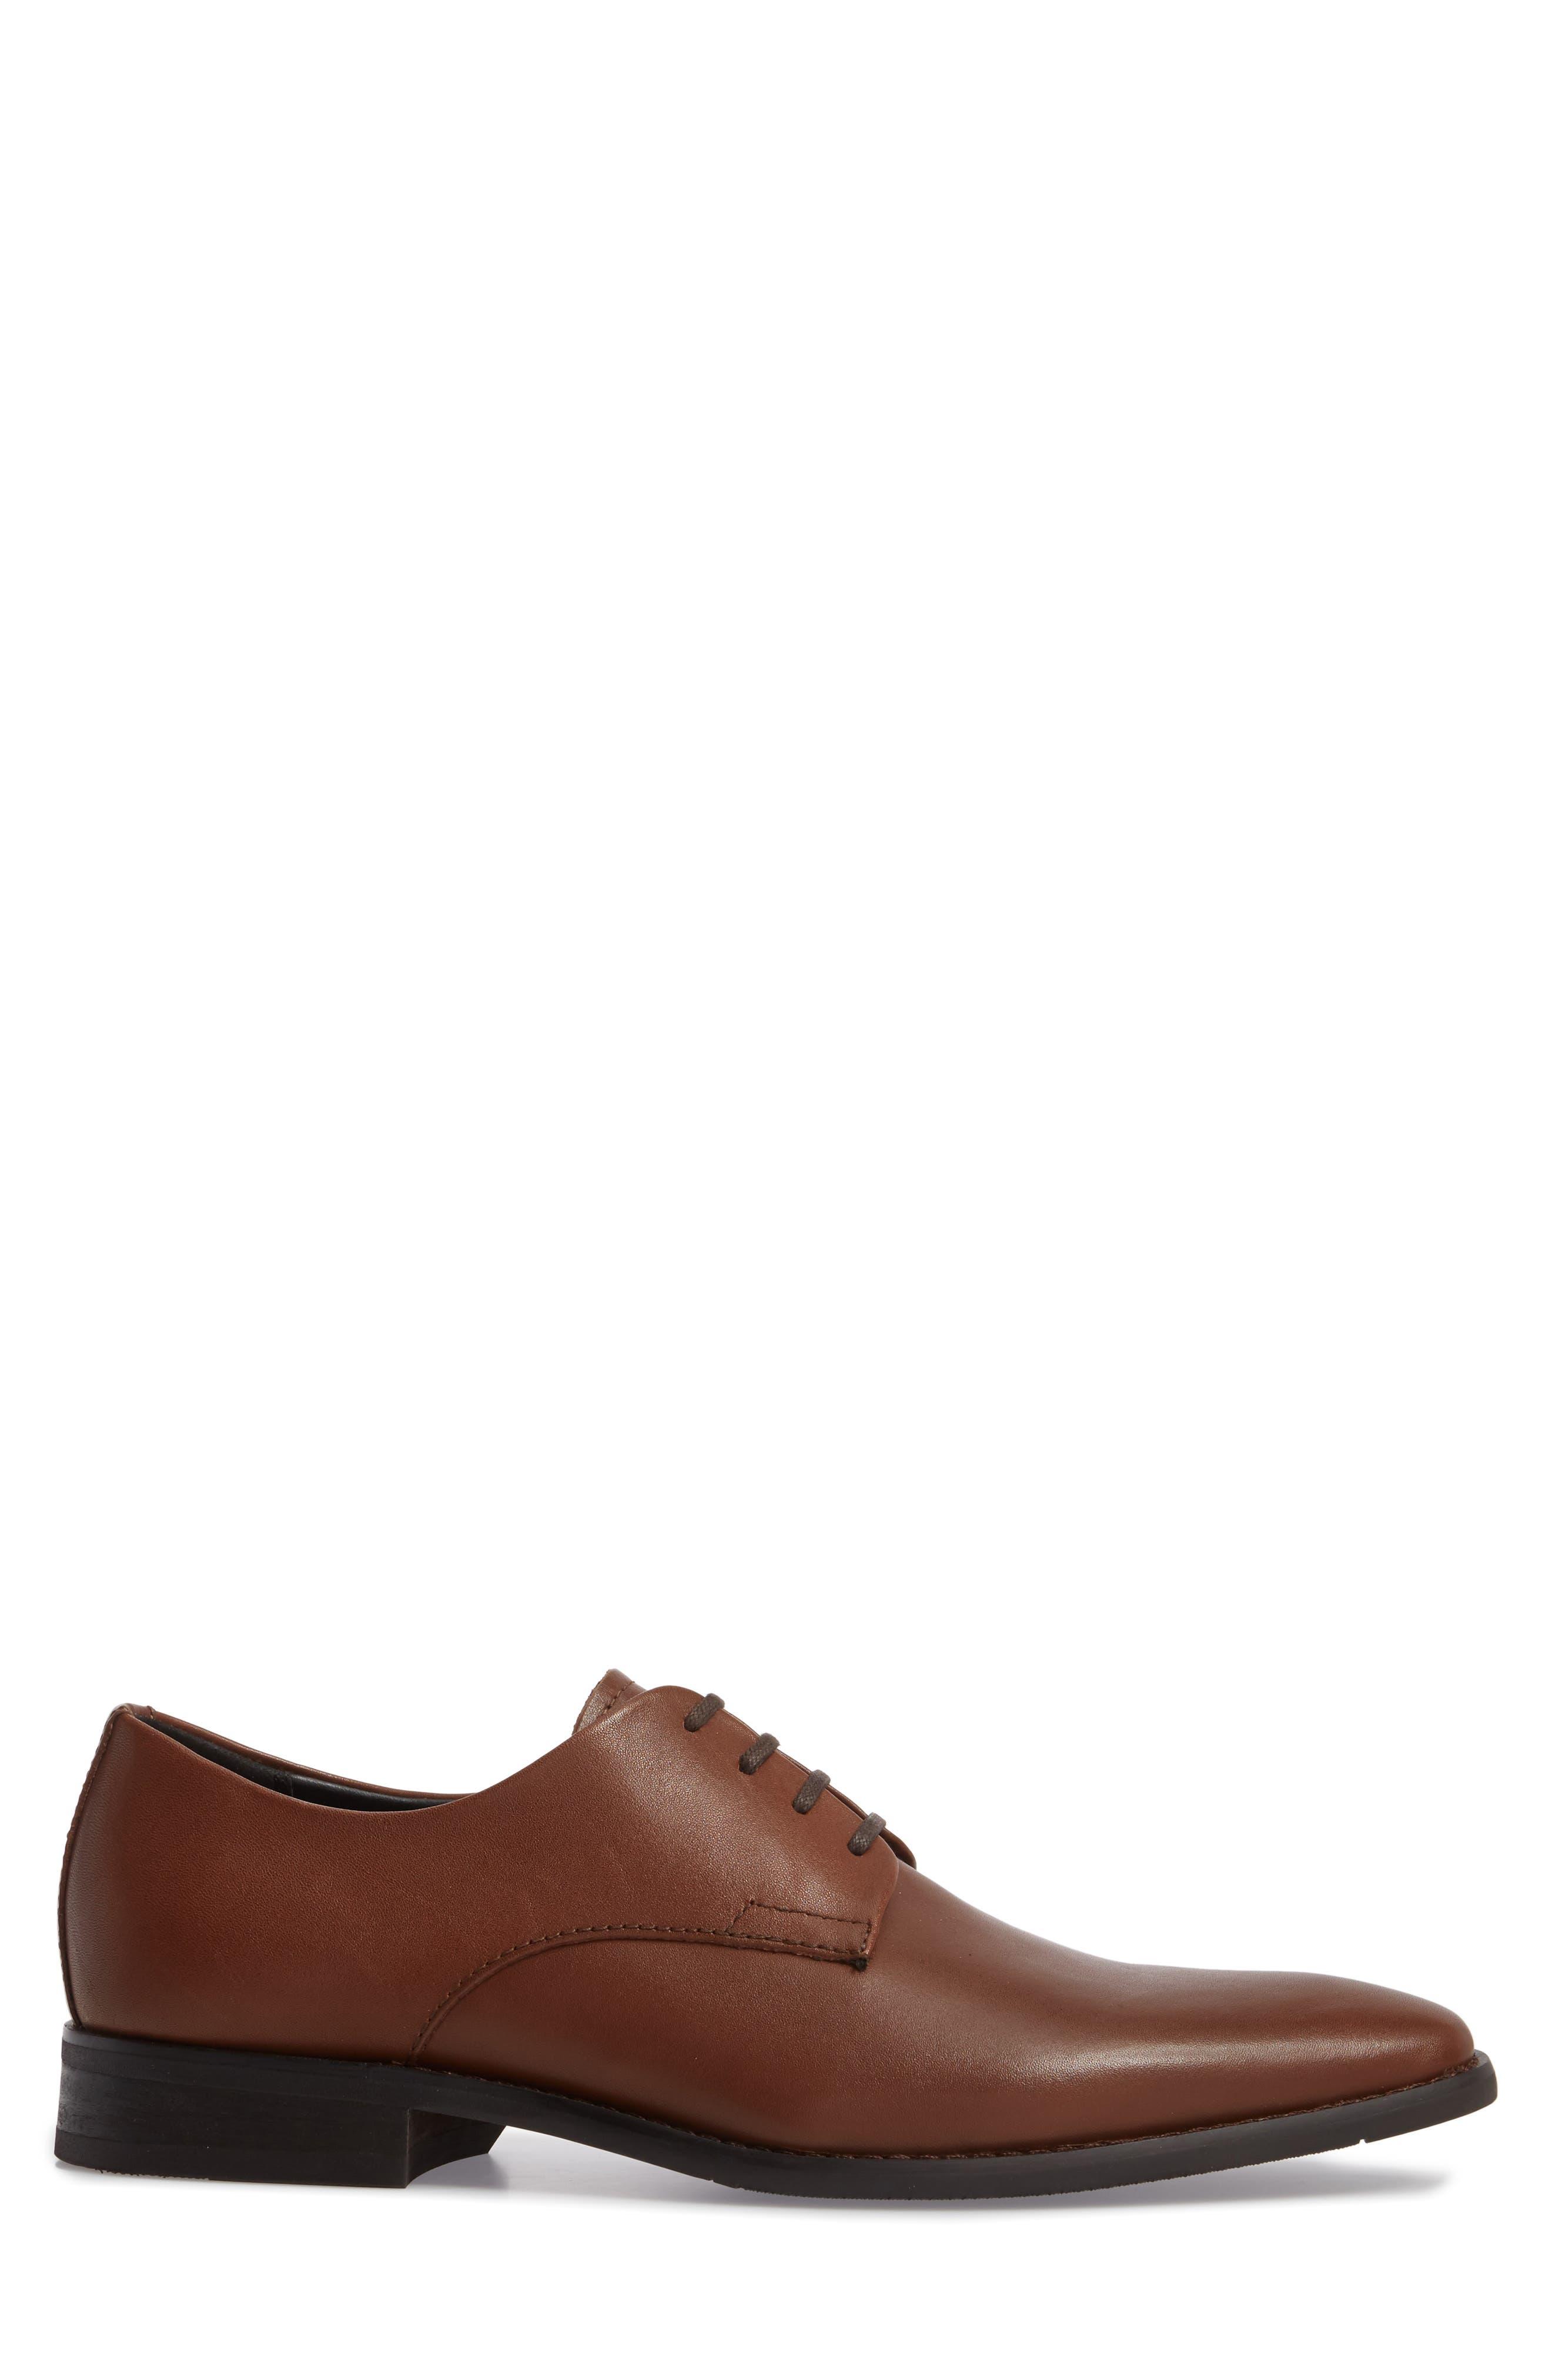 'Ramses' Plain Toe Derby,                             Alternate thumbnail 3, color,                             Tan Leather